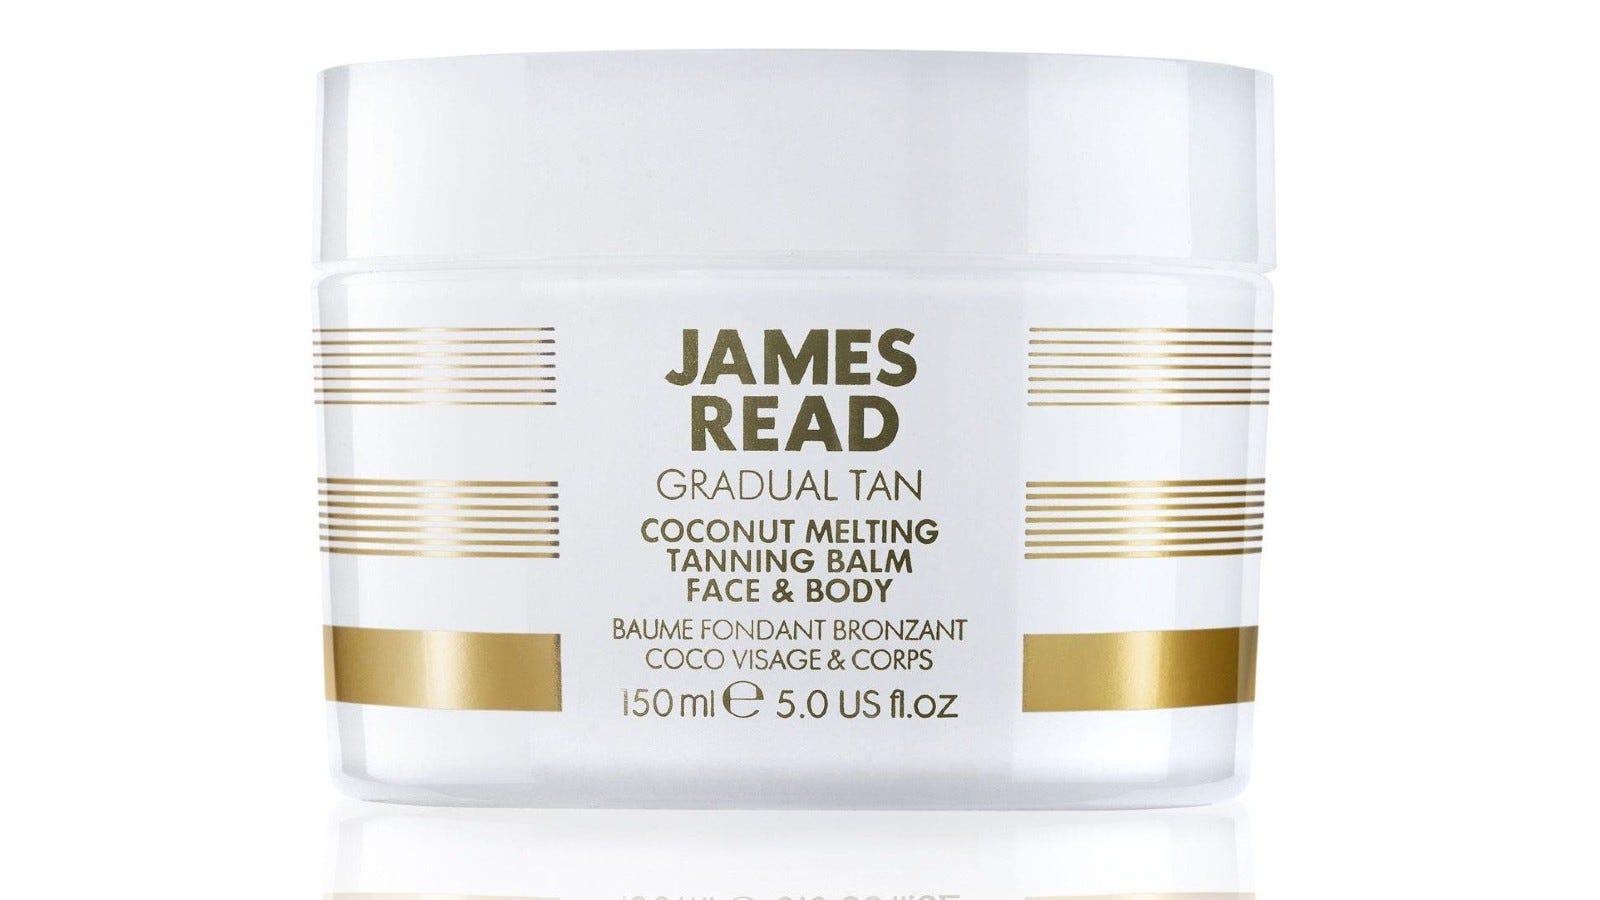 James Read Tan Coconut Melting Tanning Balm